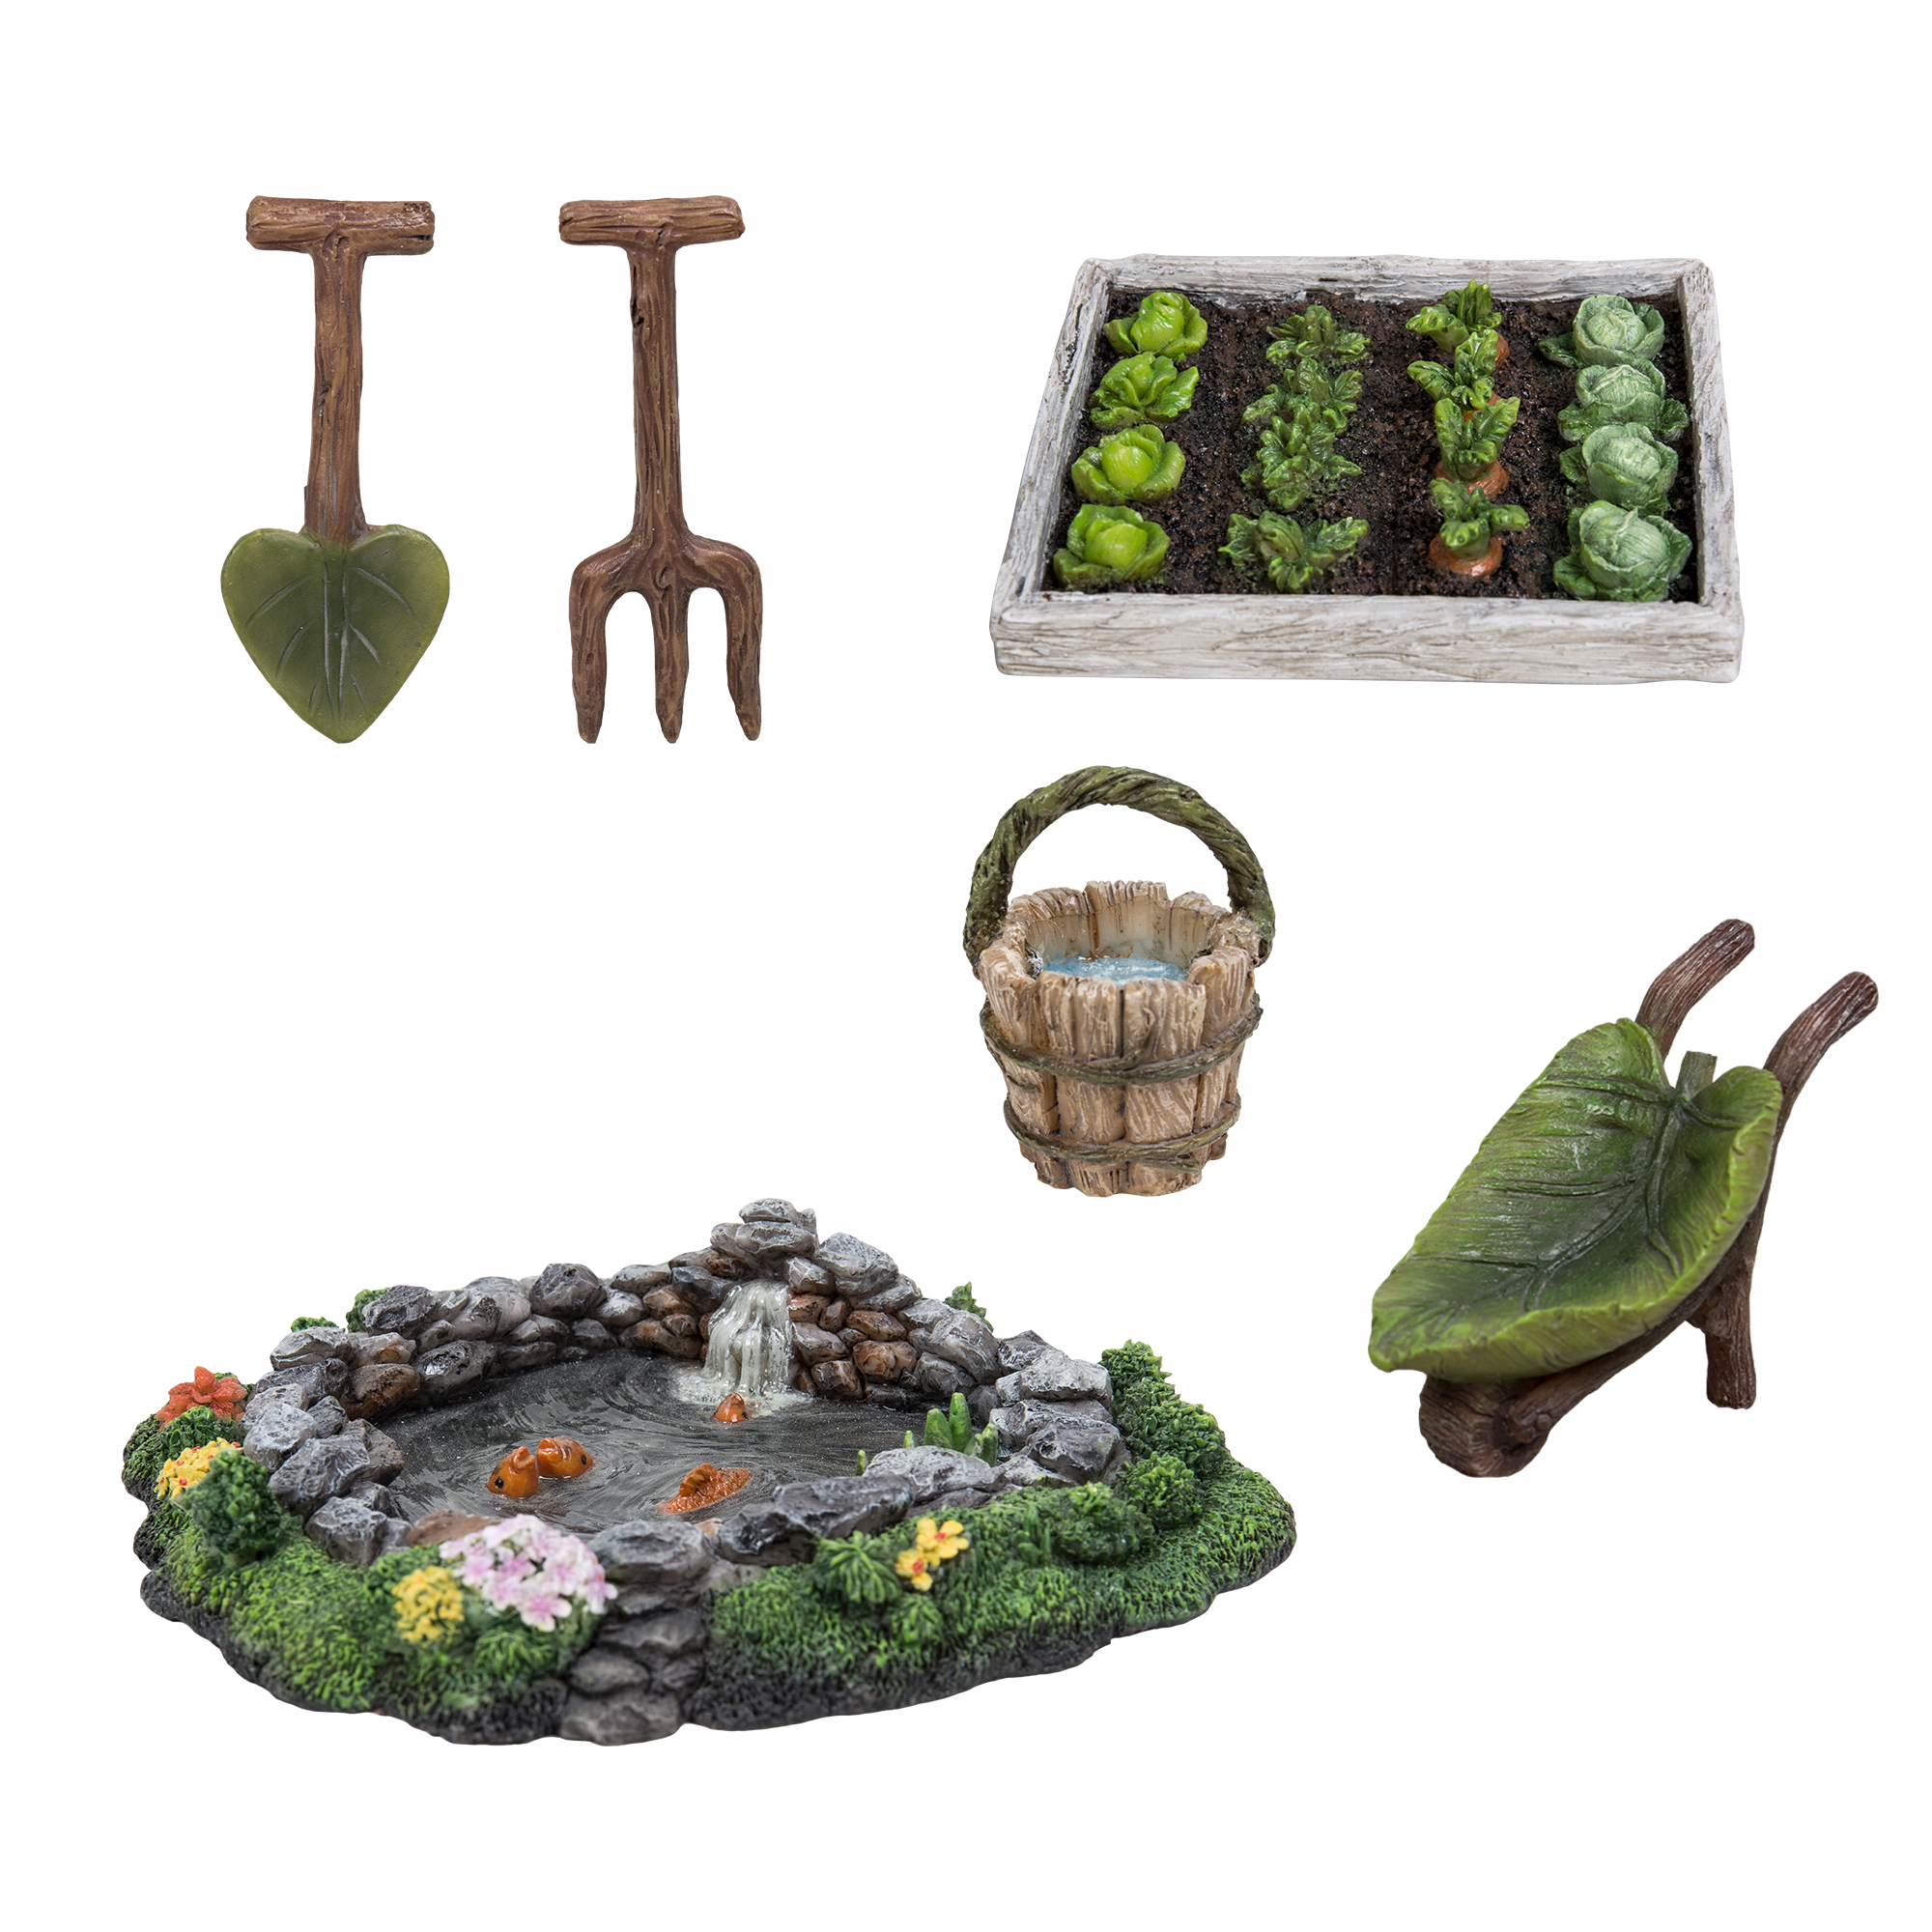 Fairy Garden Expansion Pack - Making the Garden